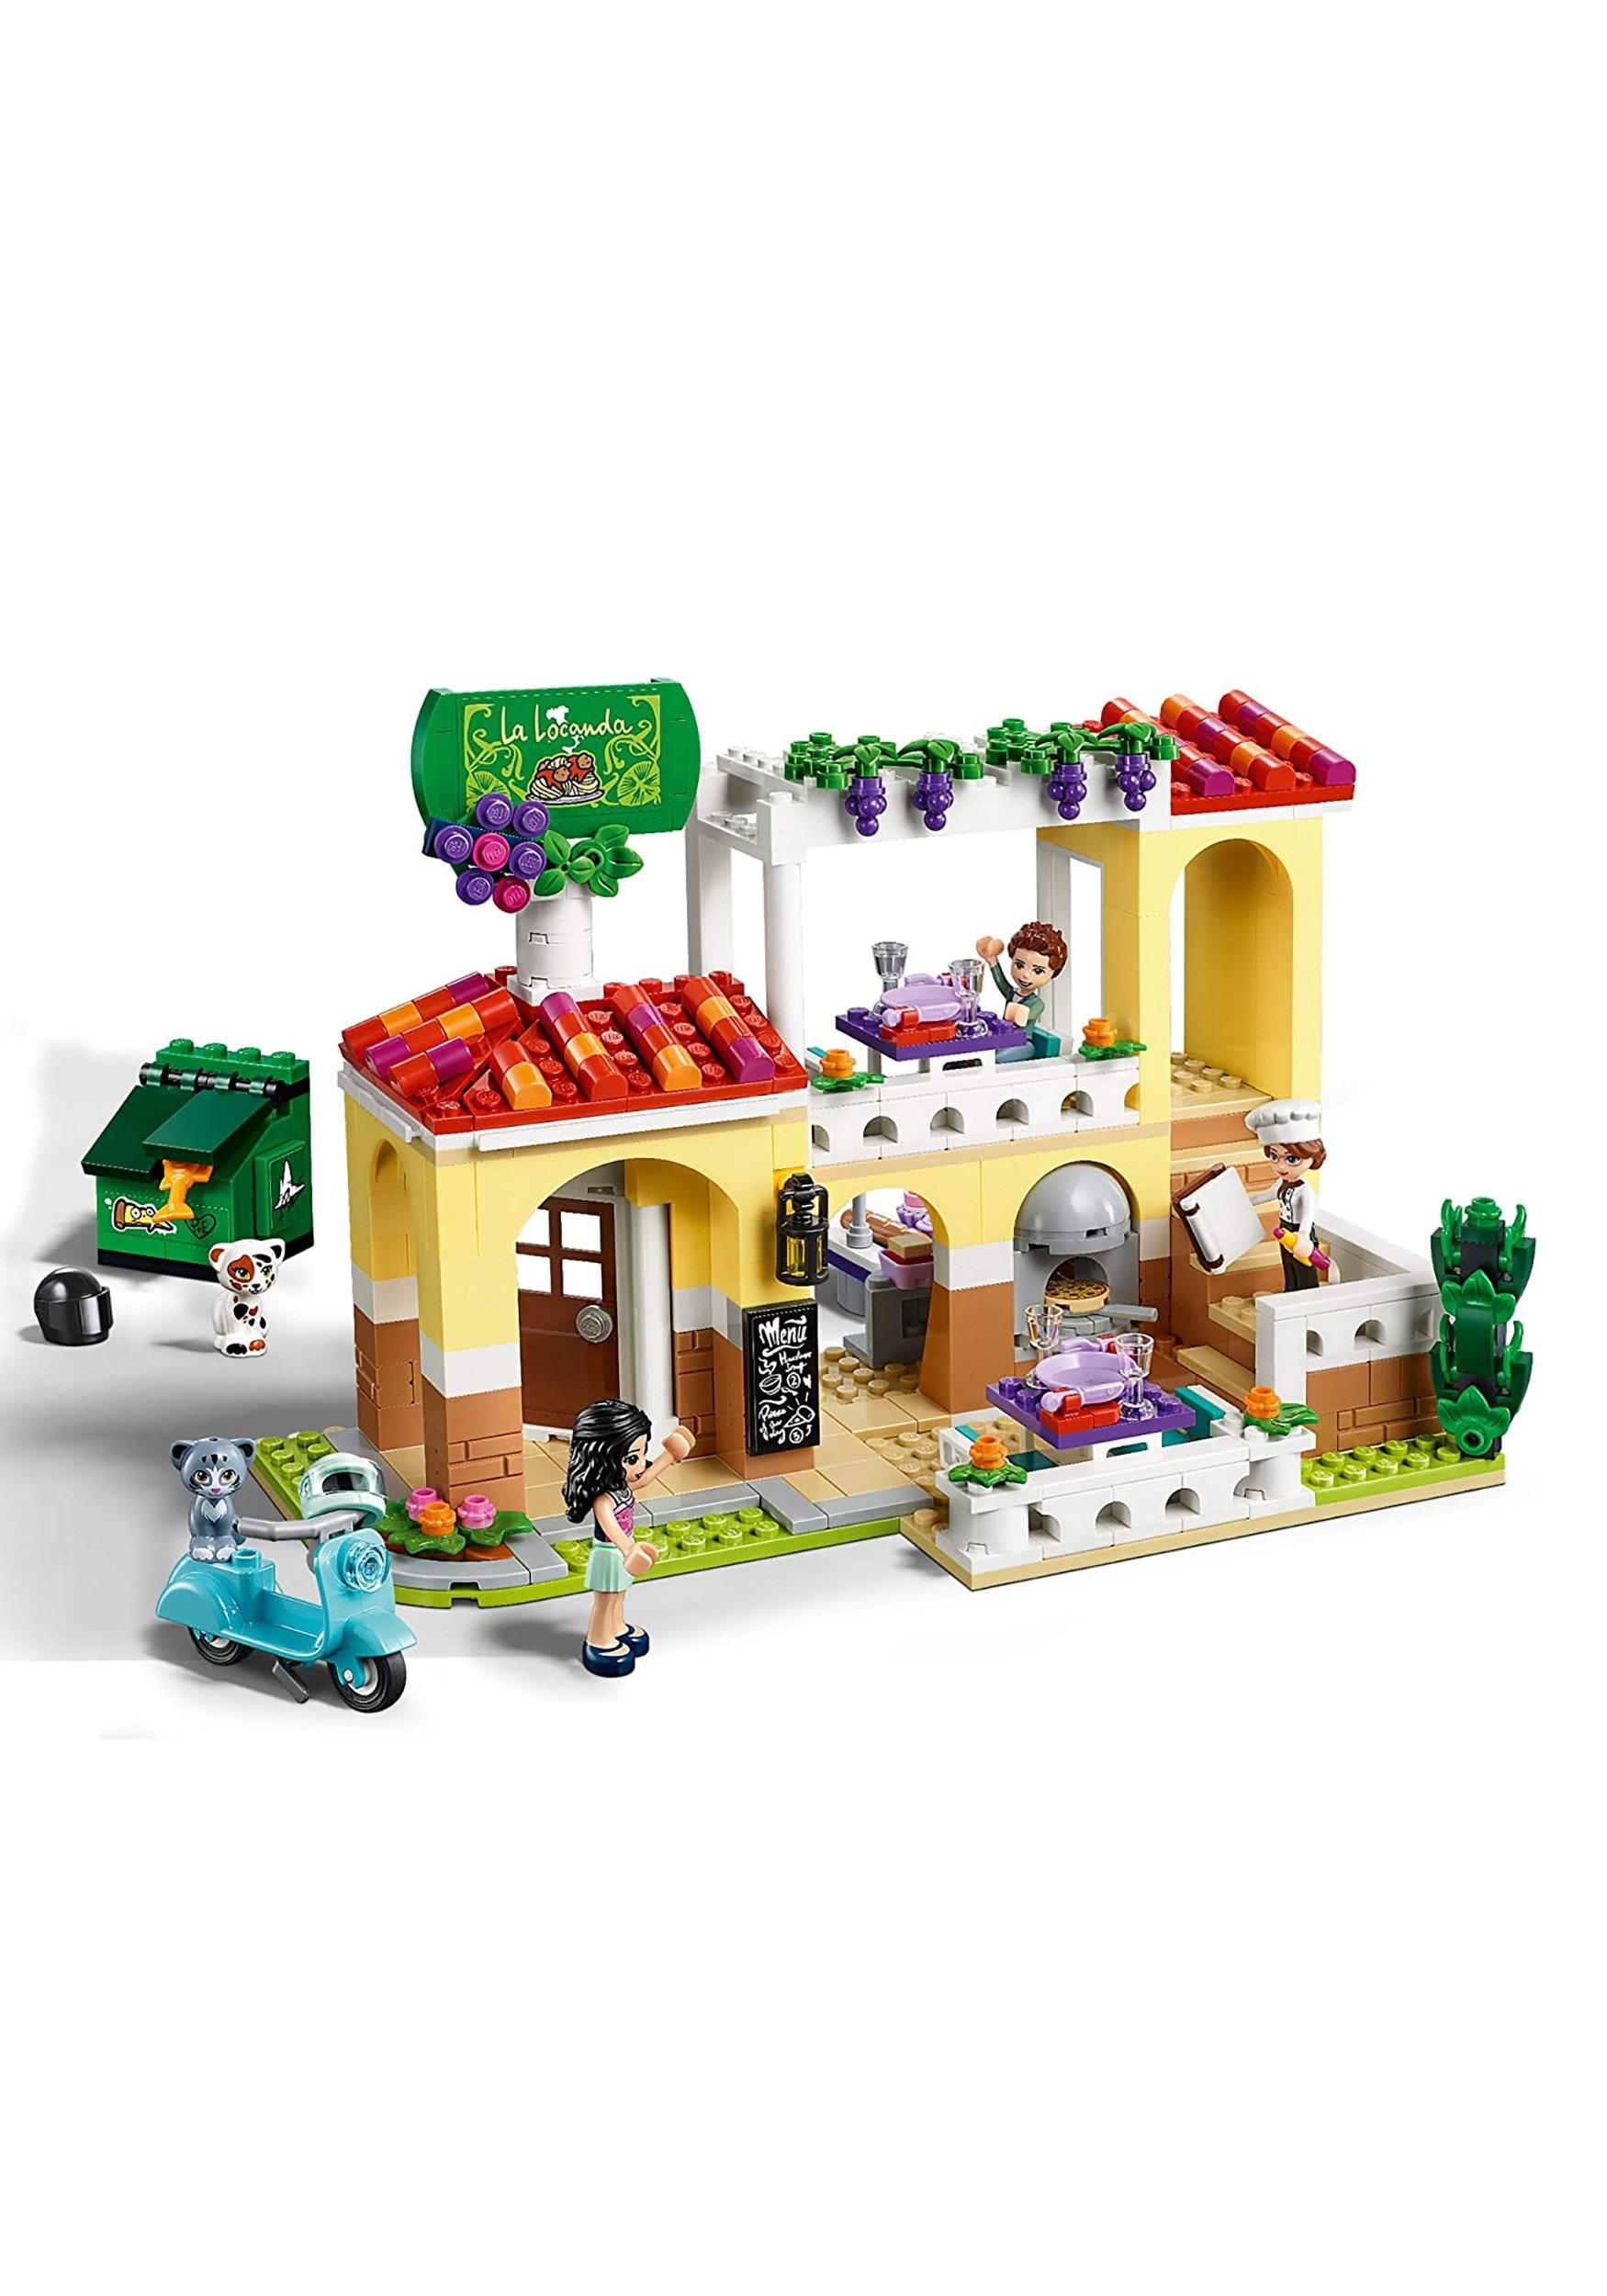 LEGO Friends Heartlake City Restaurant Building Set